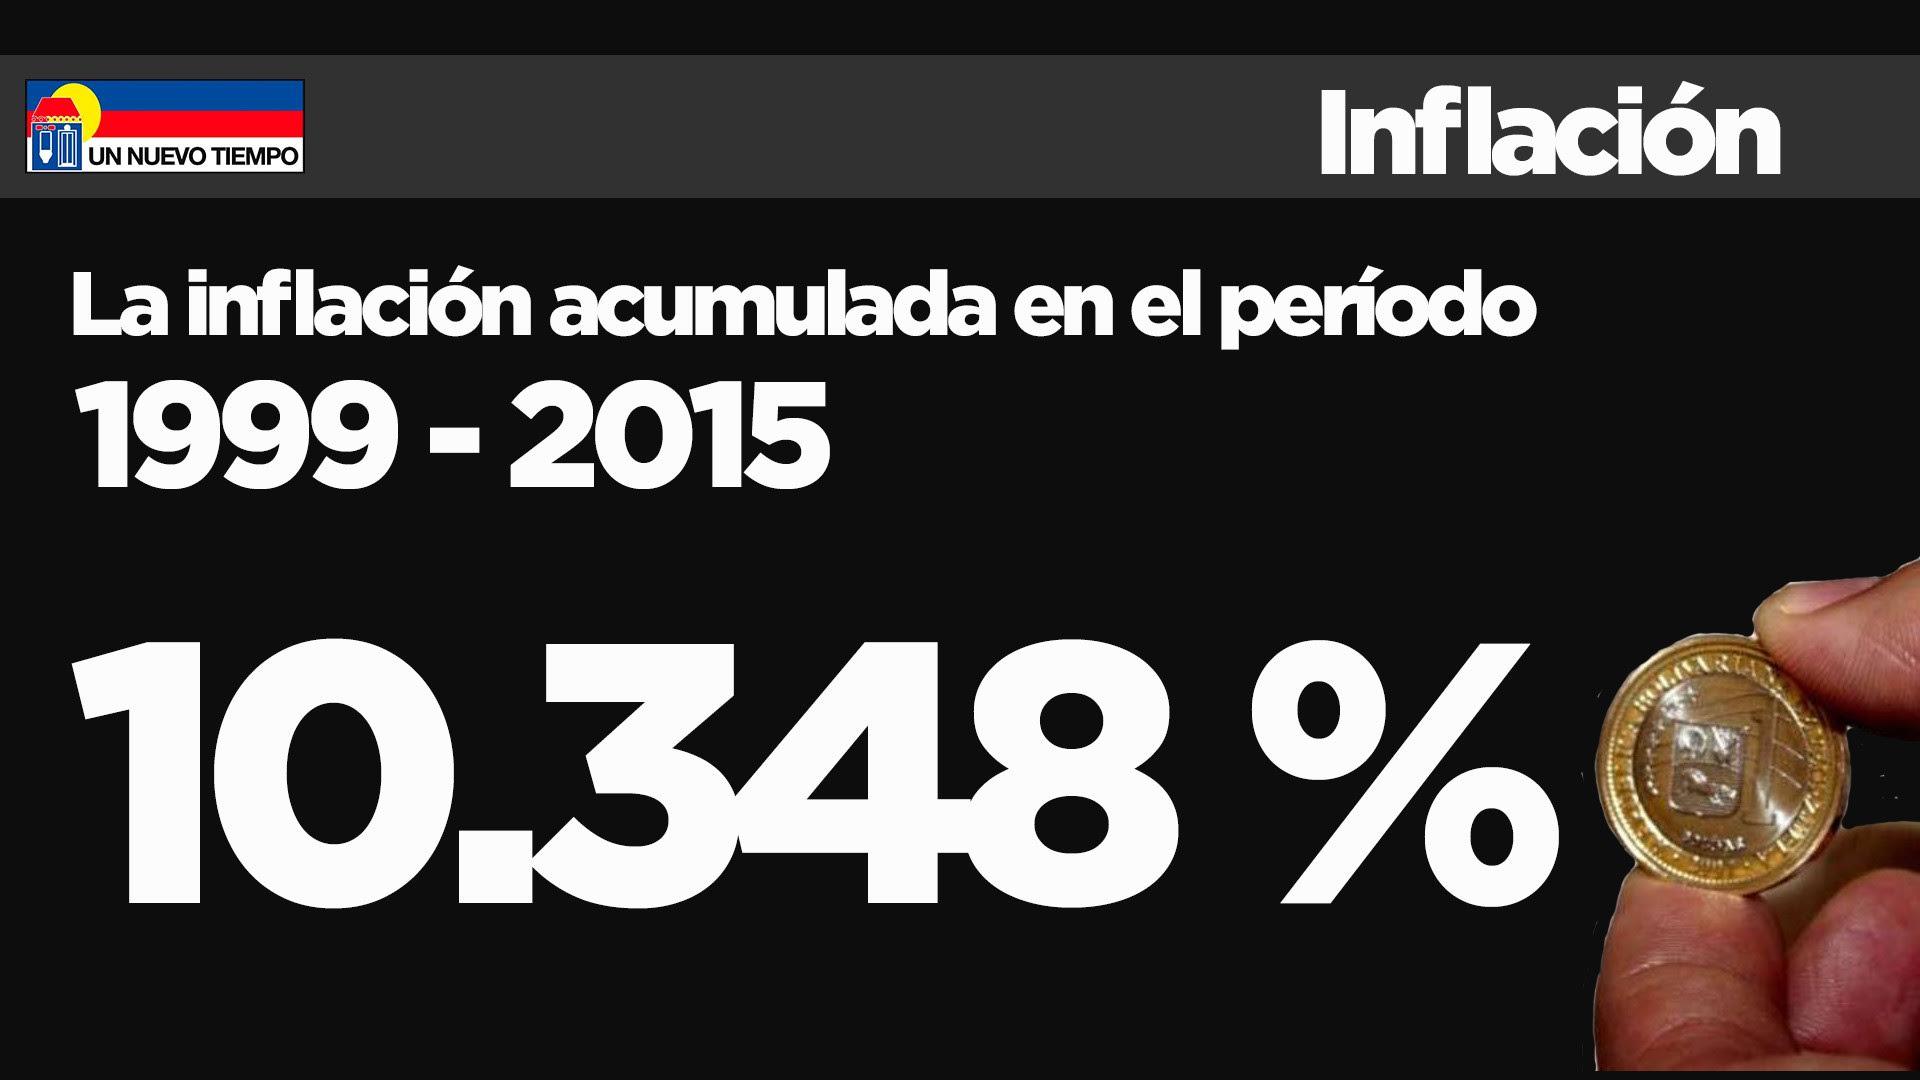 inflacion-elias-matta